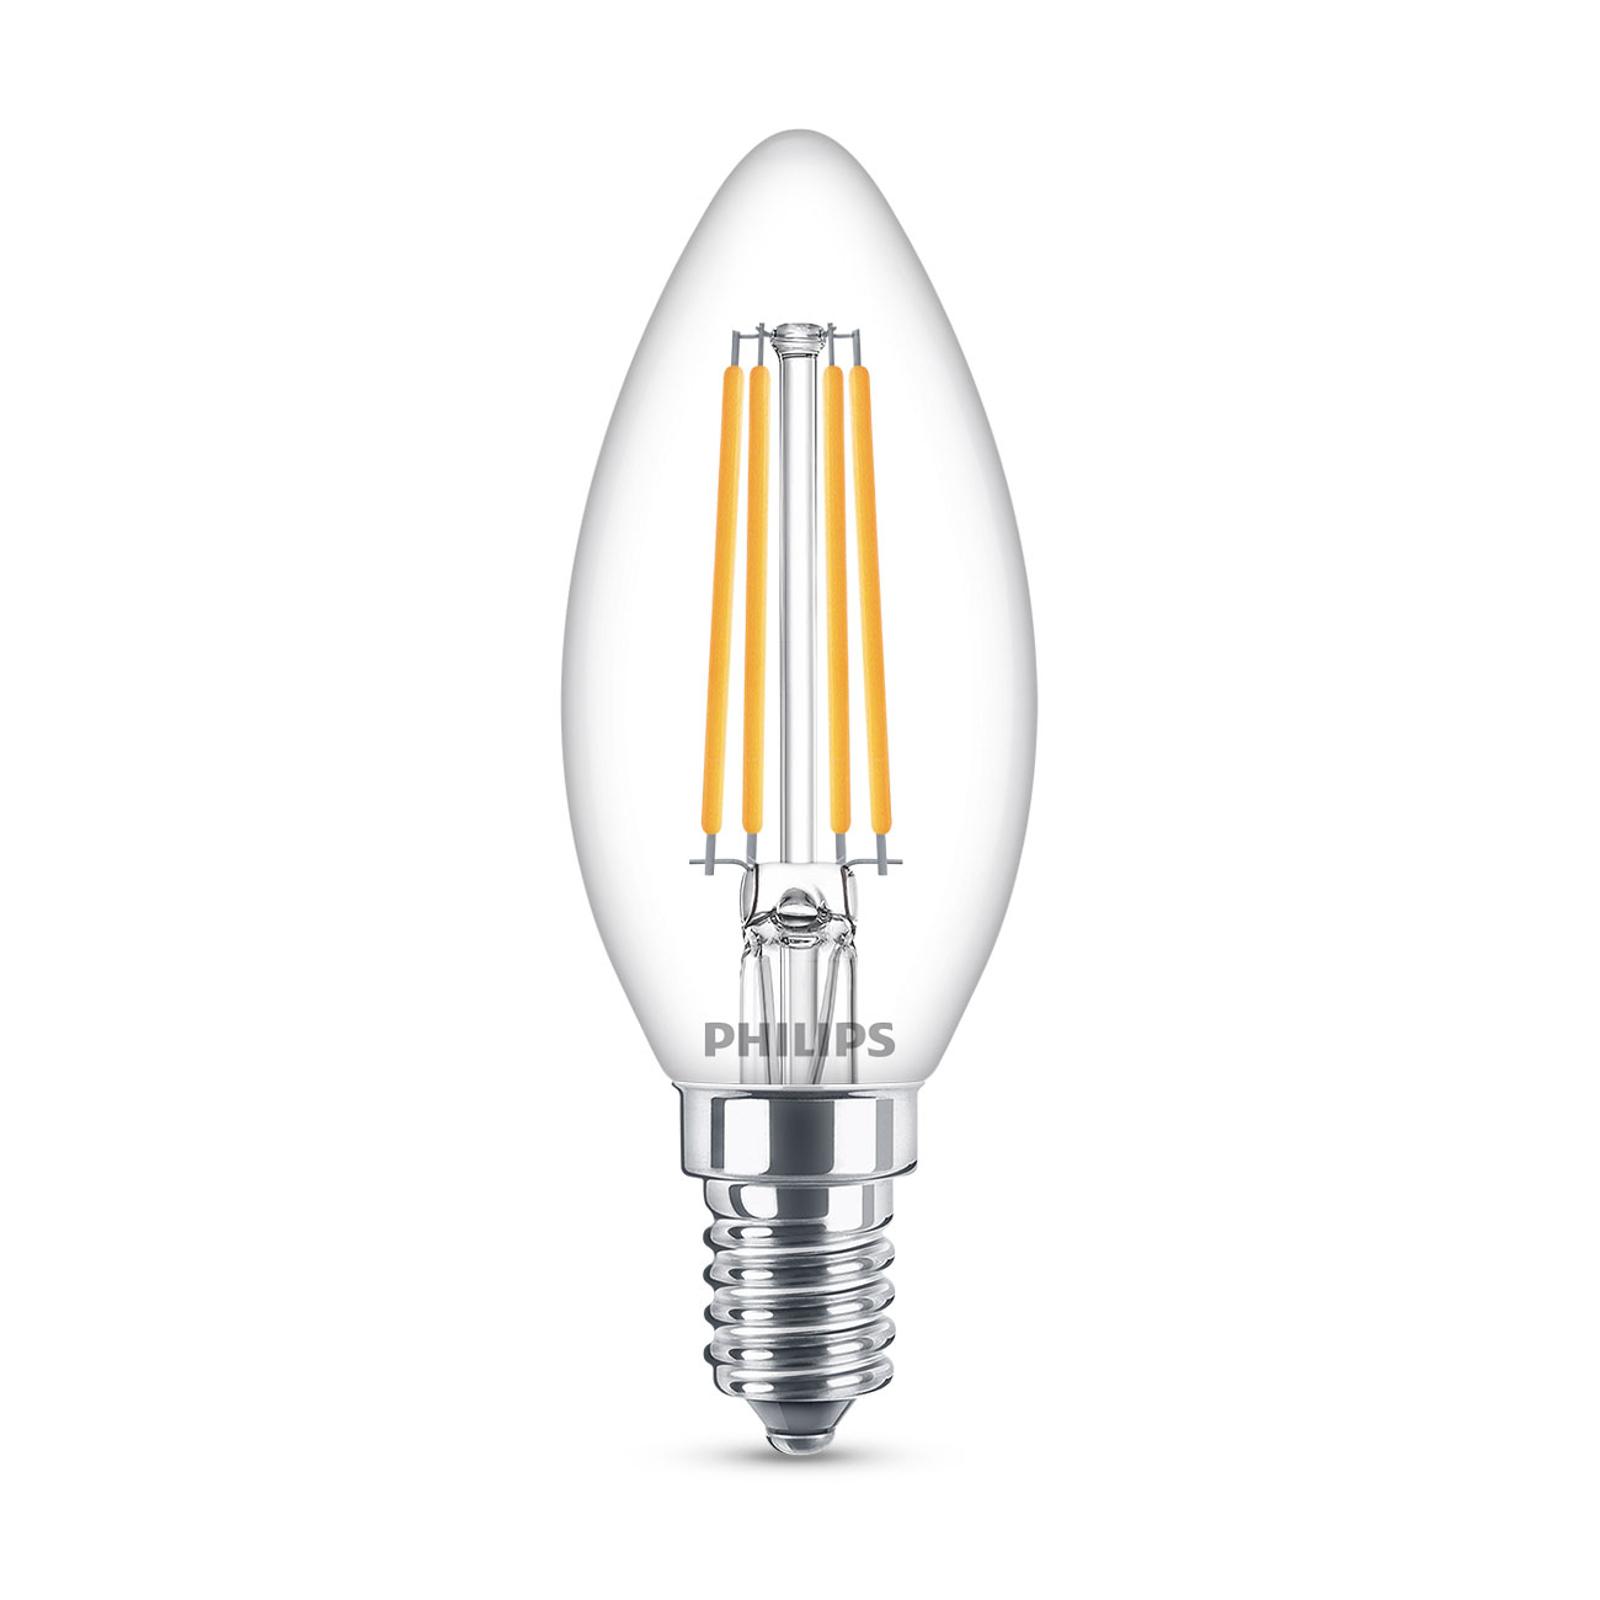 Philips Classic LED-lampa E14 B35 6,5W klar